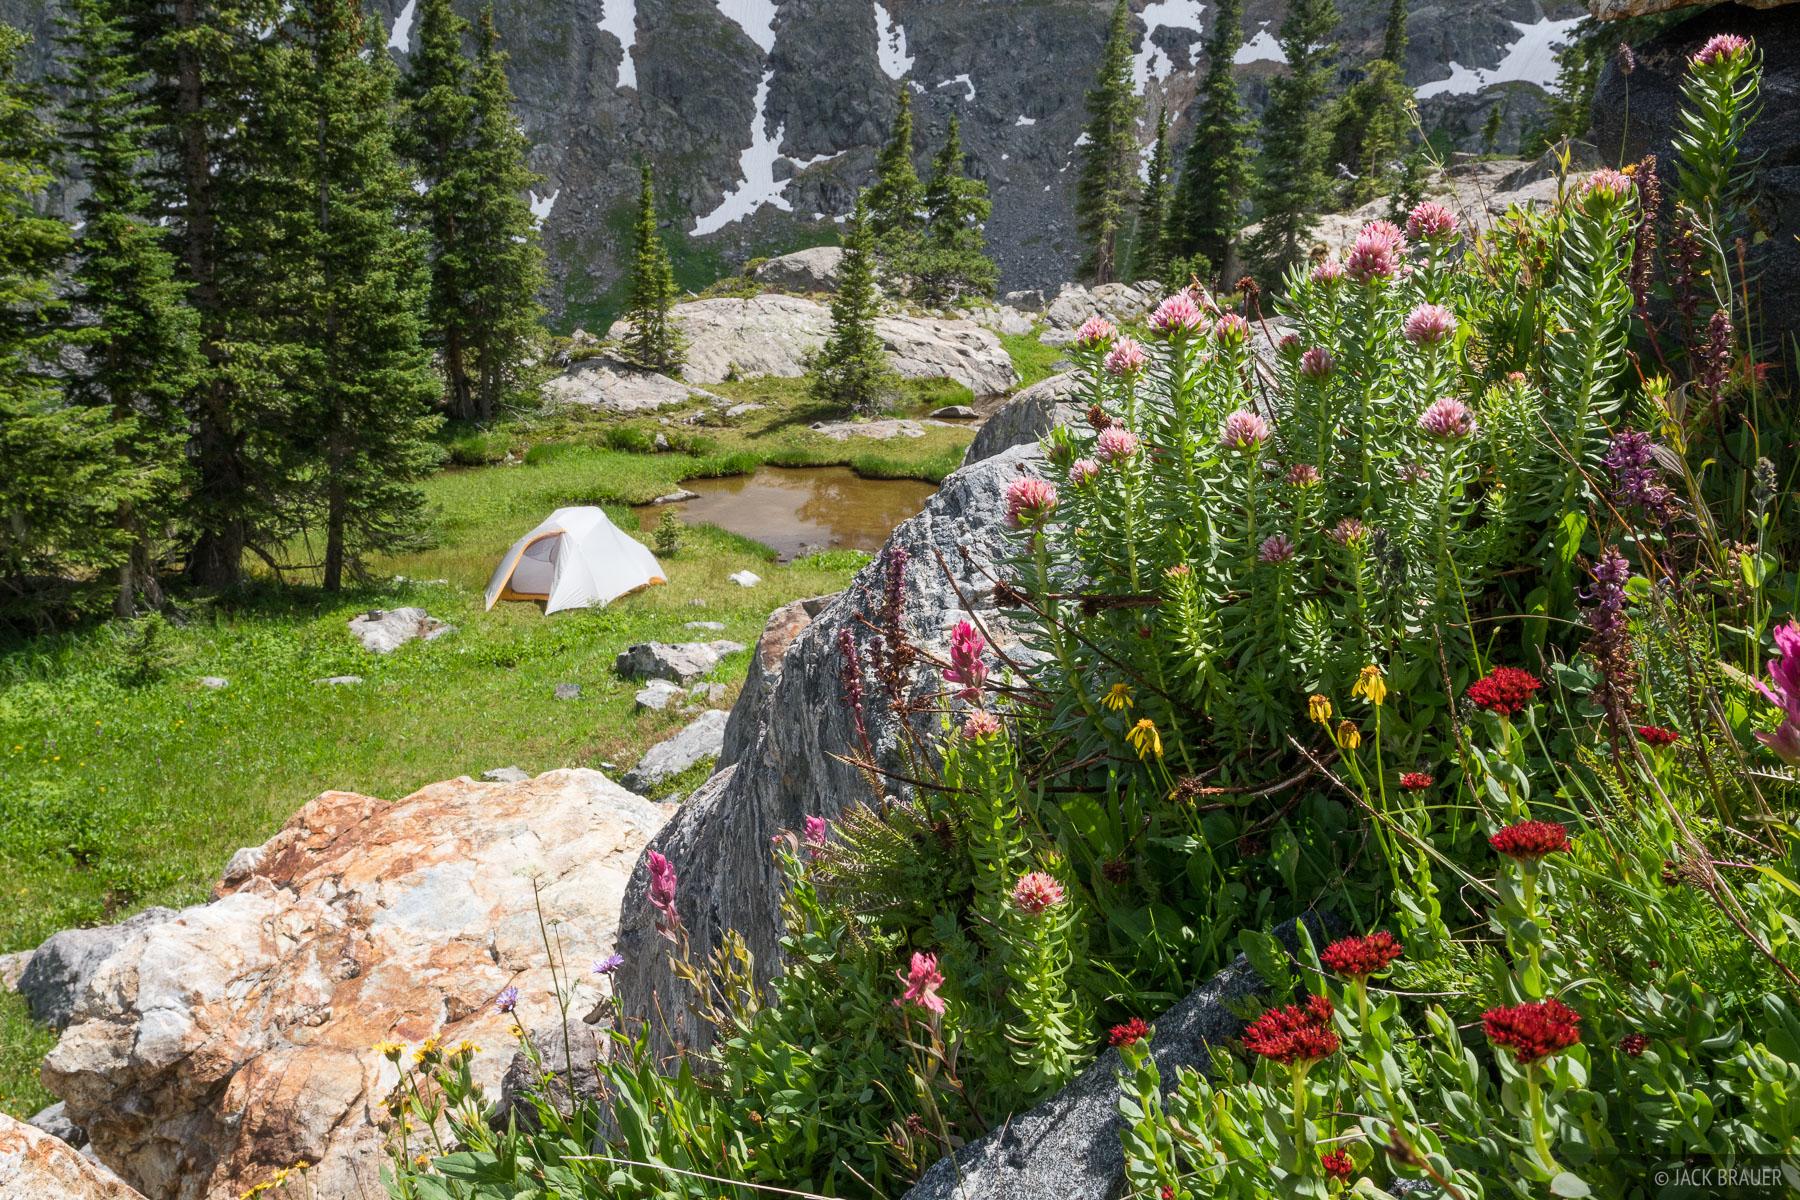 Colorado, Holy Cross Wilderness, tent, wildflowers, Sawatch Range, photo